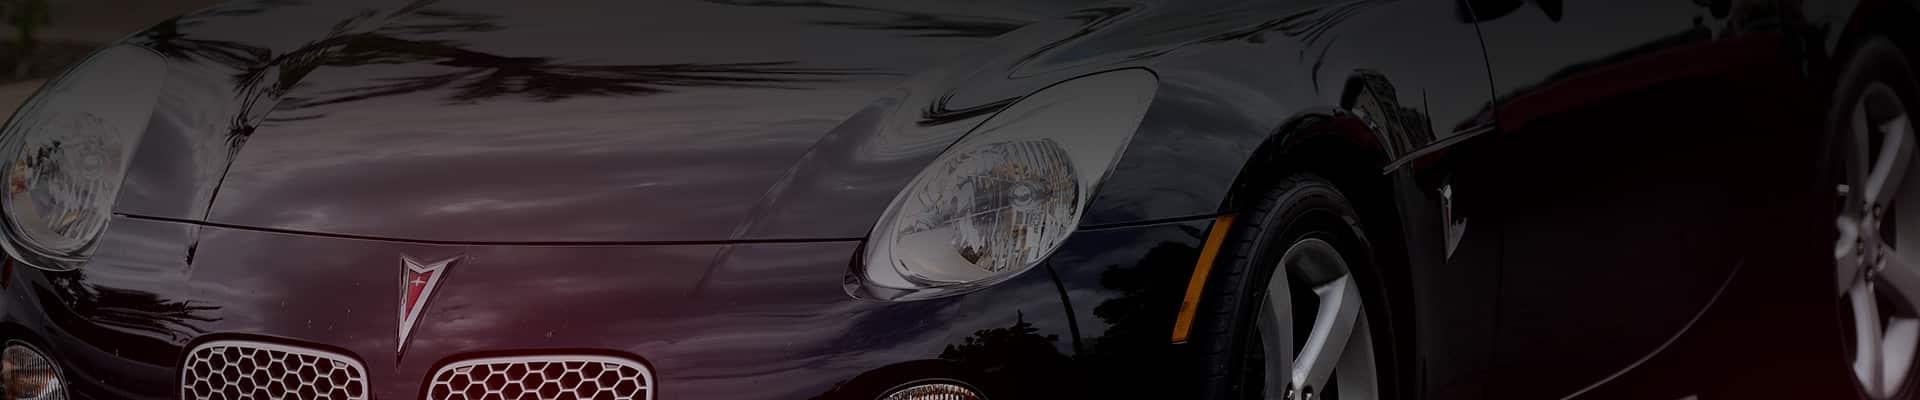 רכב פונטיאק